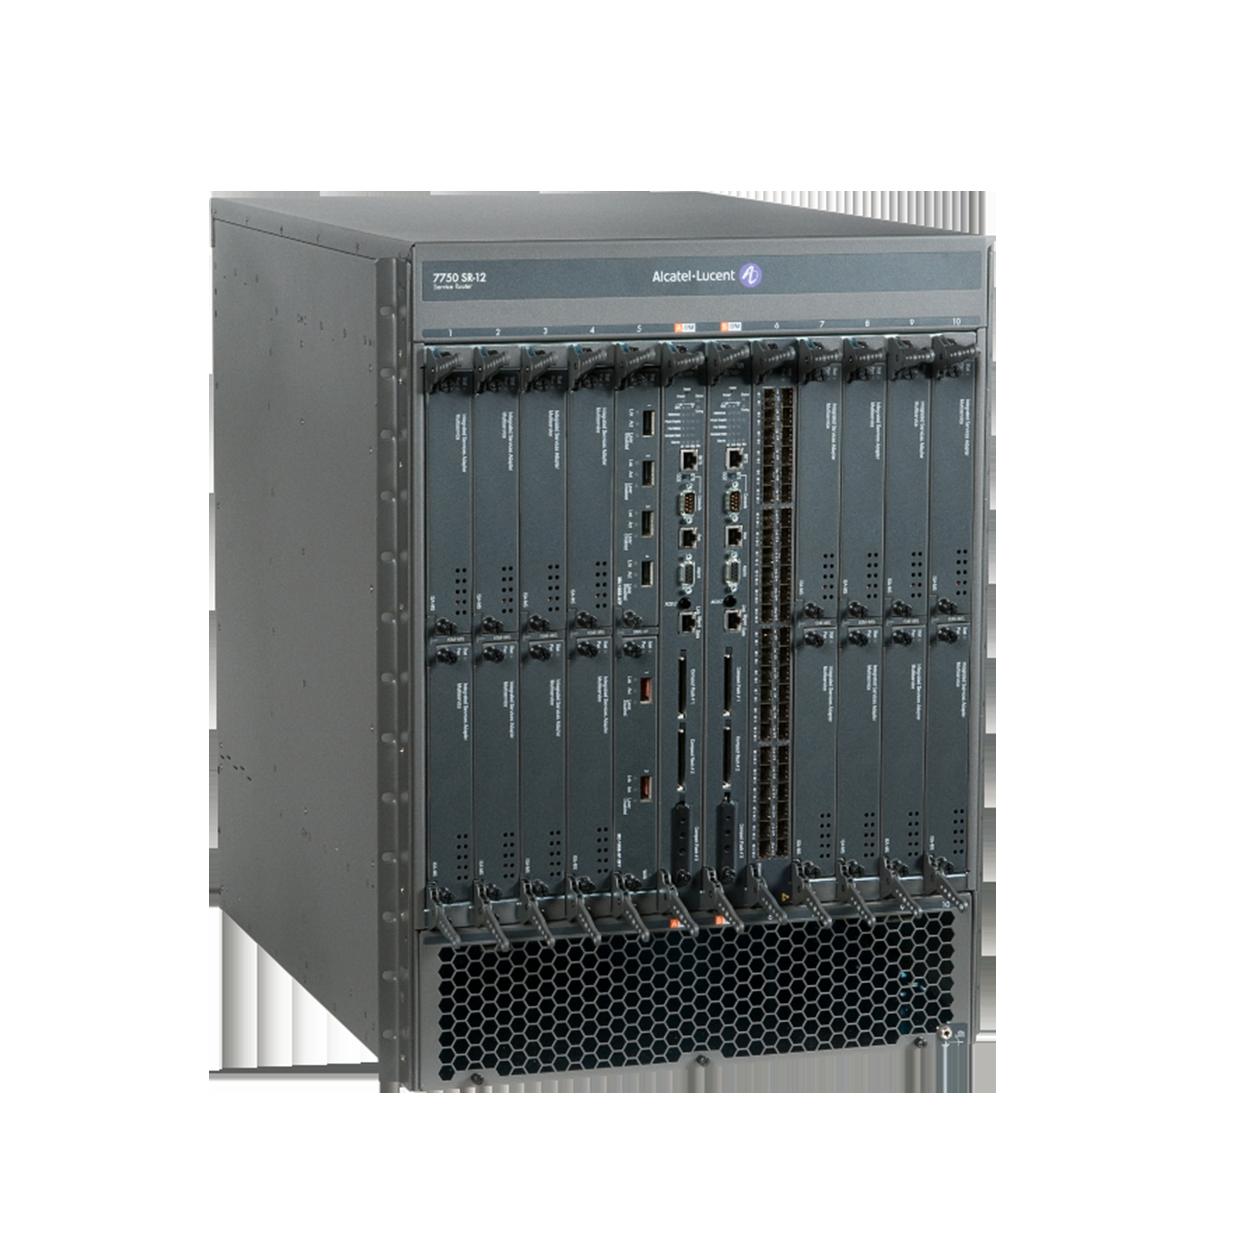 7750 sr 7450 ess iom r10 en datasheet | network switch.